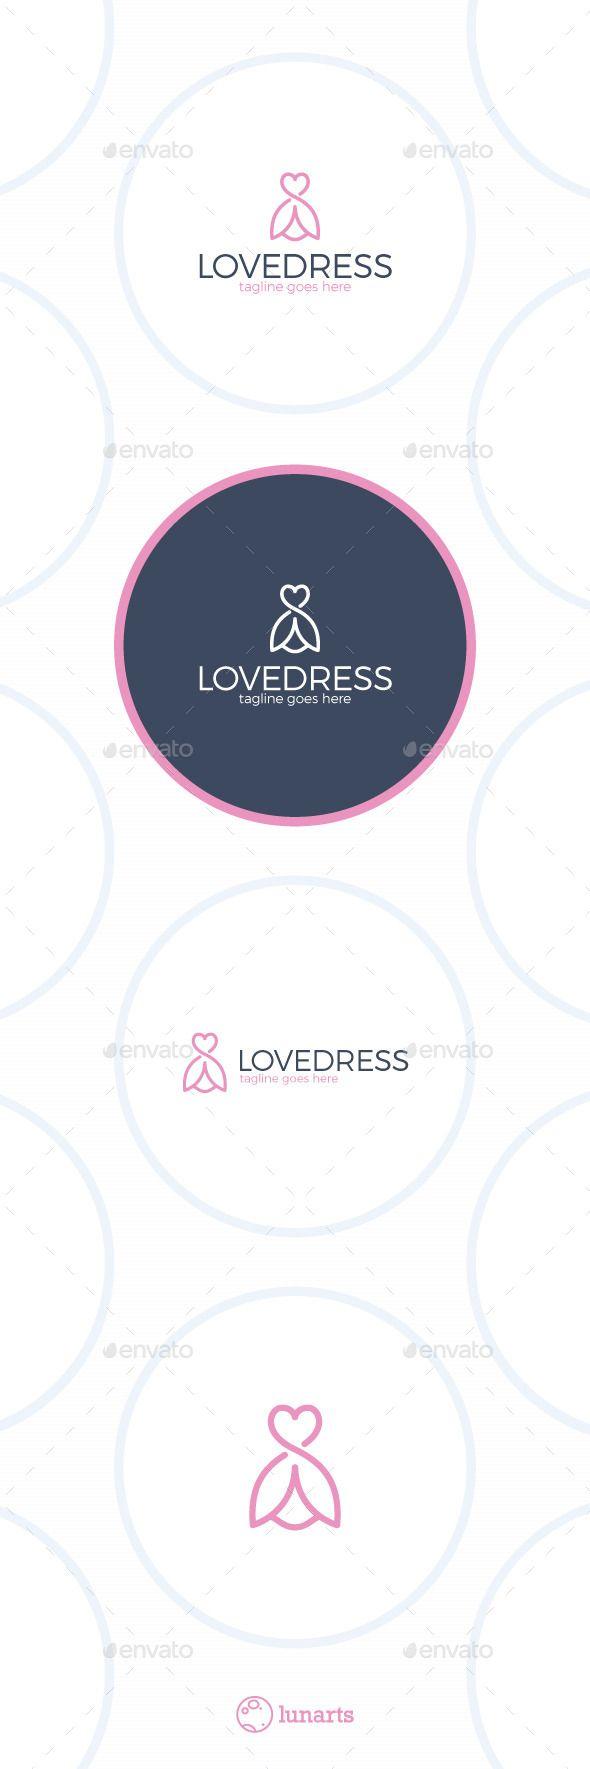 15 Must-see Fashion Logo Design Pins